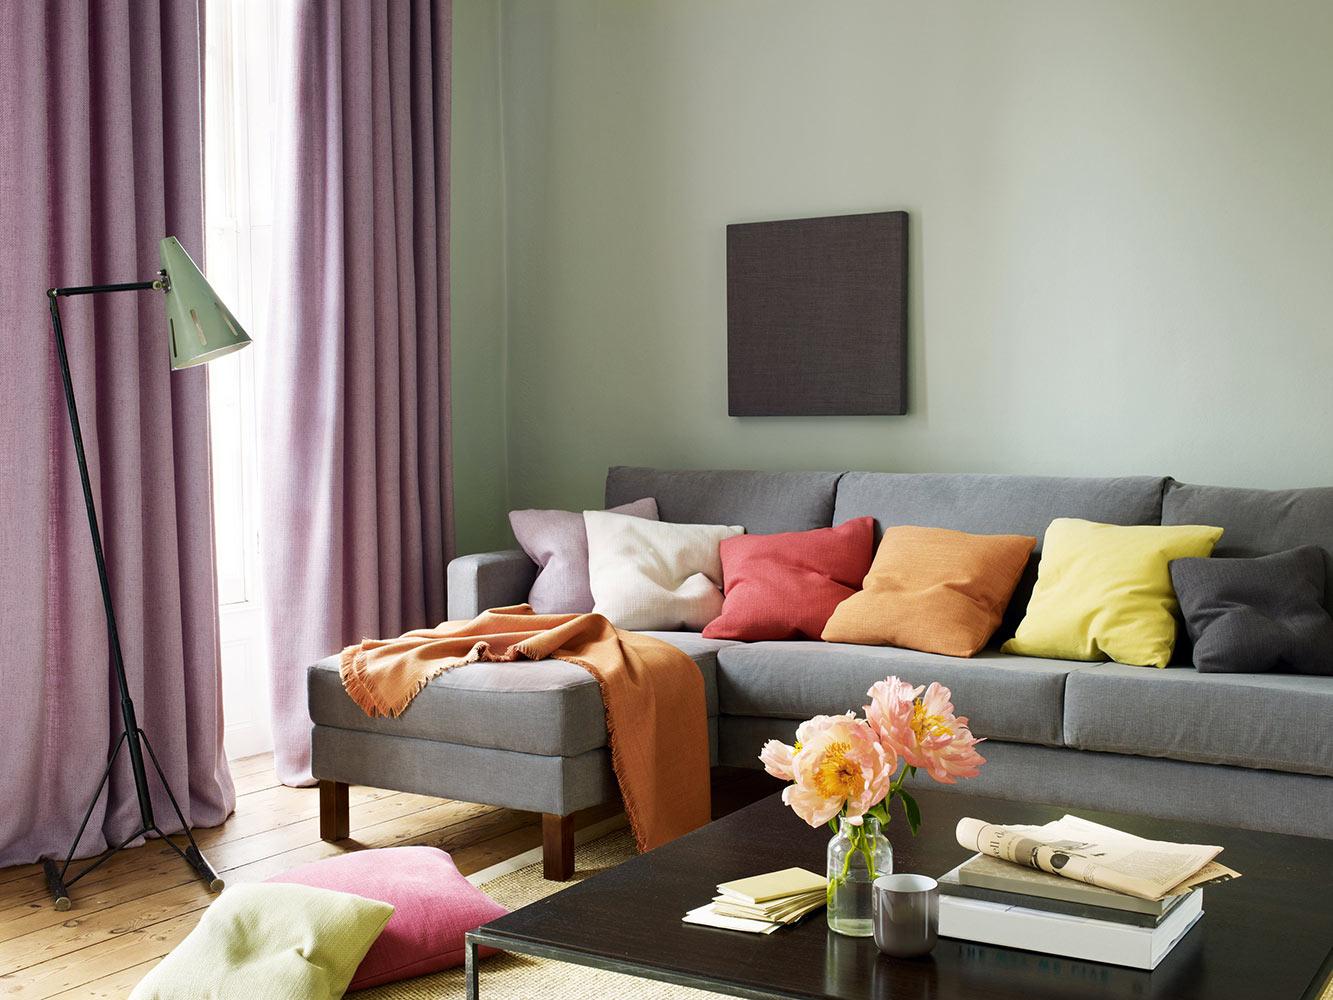 Petoskey-sitting-room